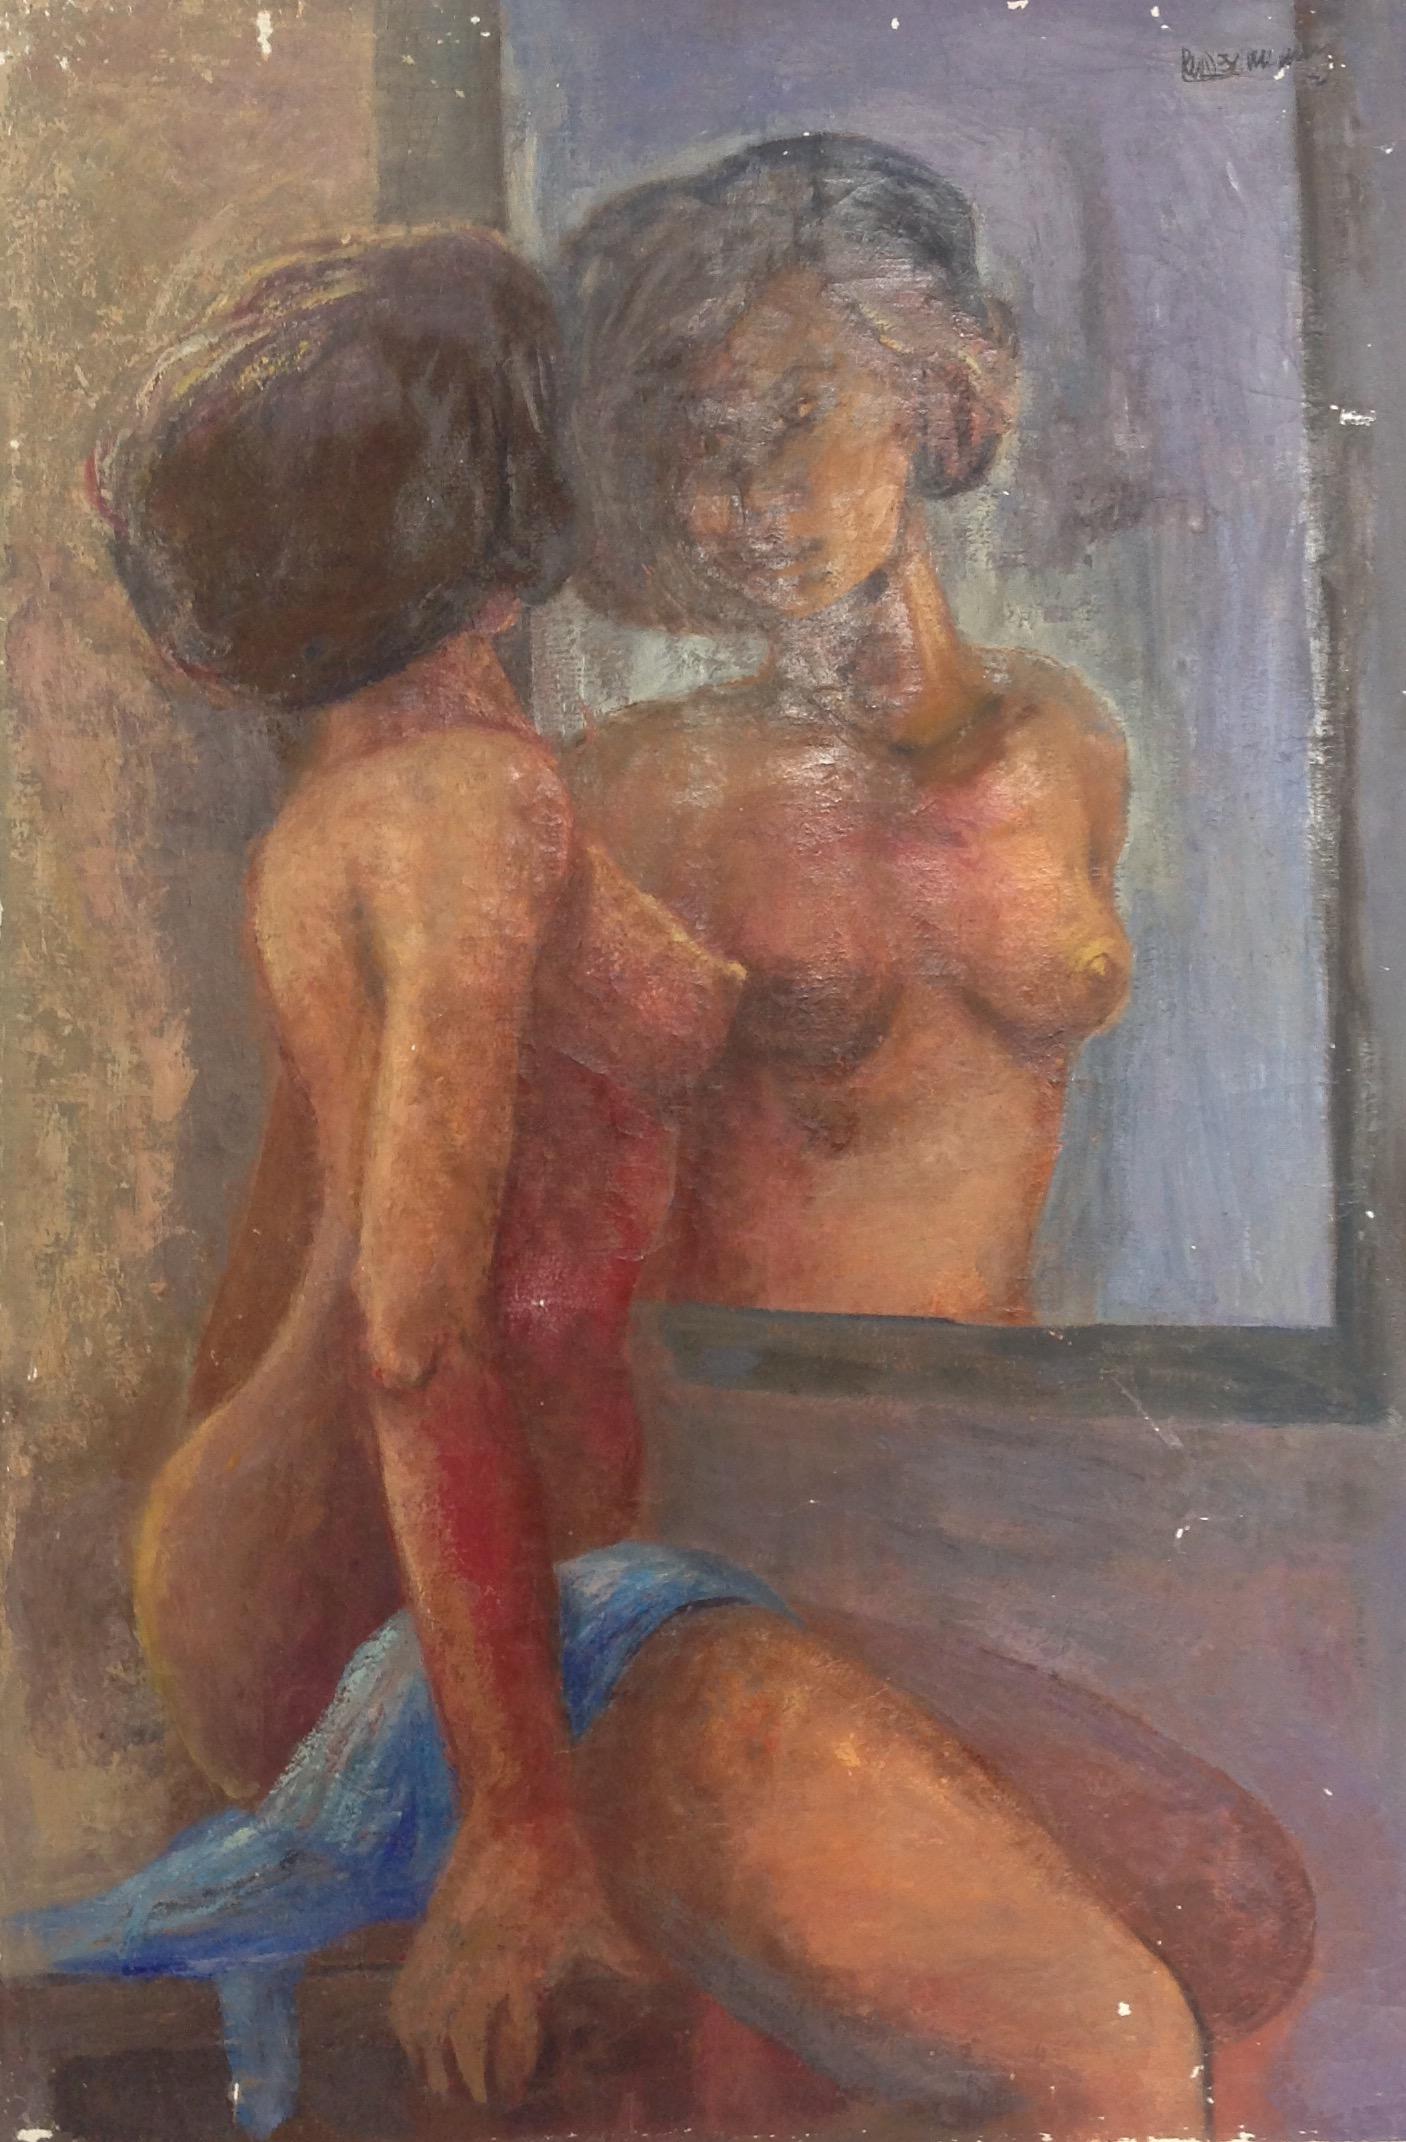 Desruisseau Rose Marie 24X36 #8-3-96 canvas